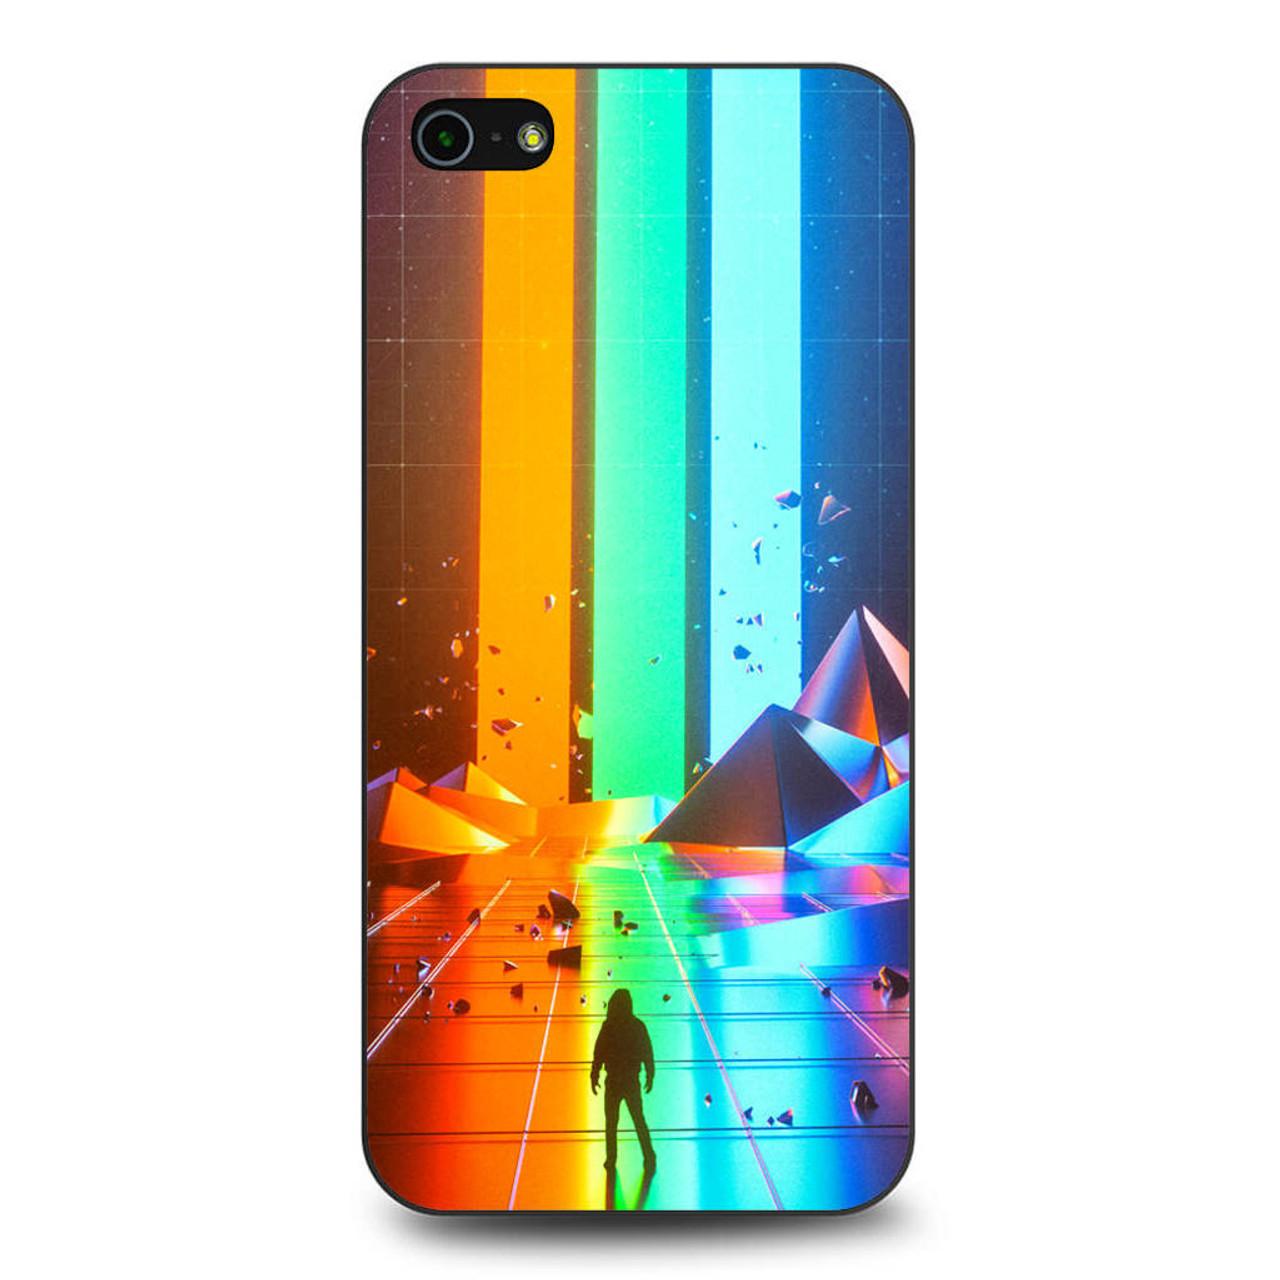 18c8fe155f2 Imagine Dragons Believer iPhone 5 5S SE Case - CASESHUNTER